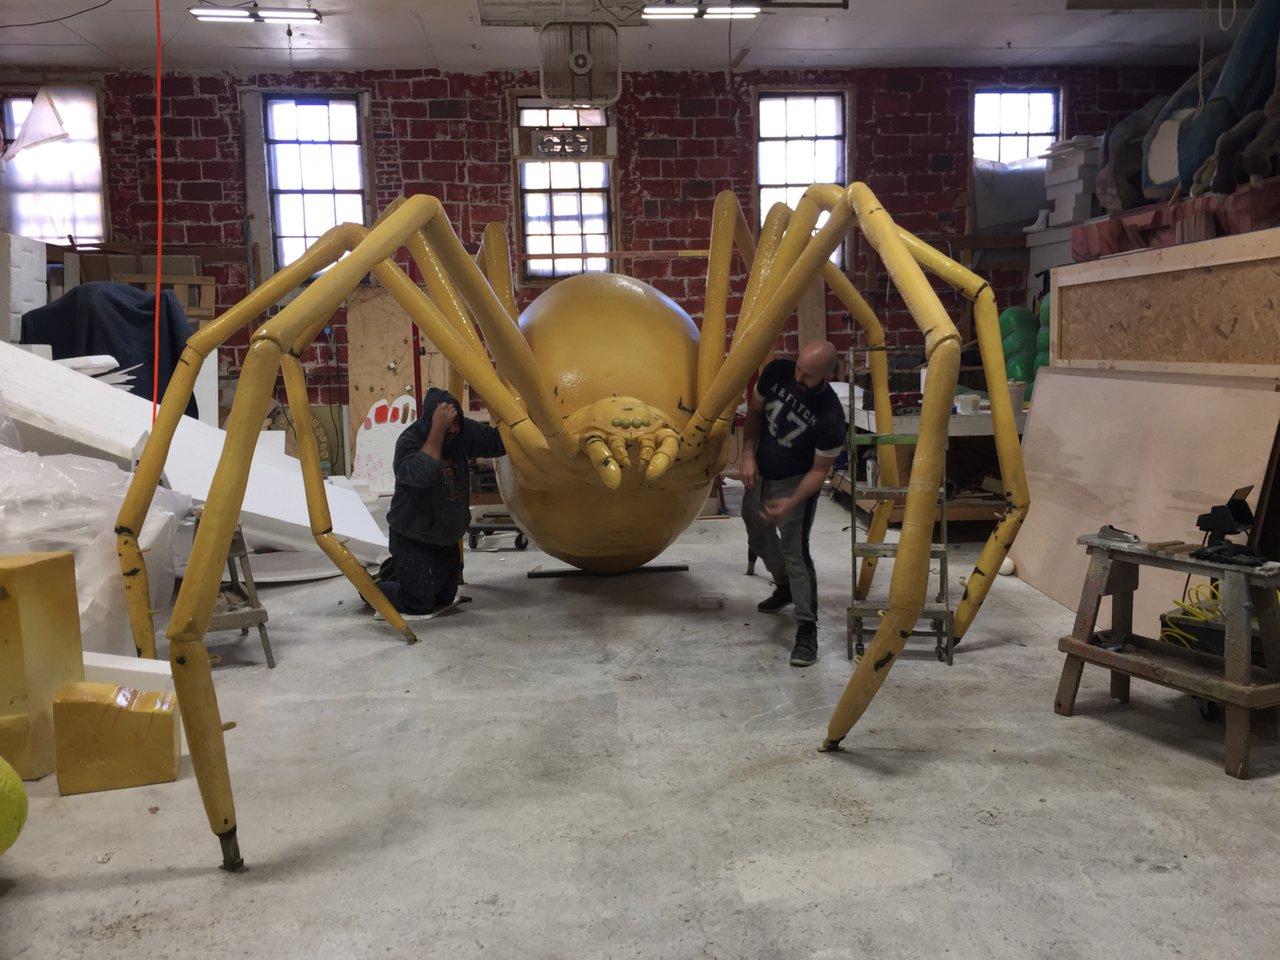 GIGANTIC Black Widow Spider Sculpt photo C62413BF-73BA-47D5-ADC2-2E221E326288.jpg